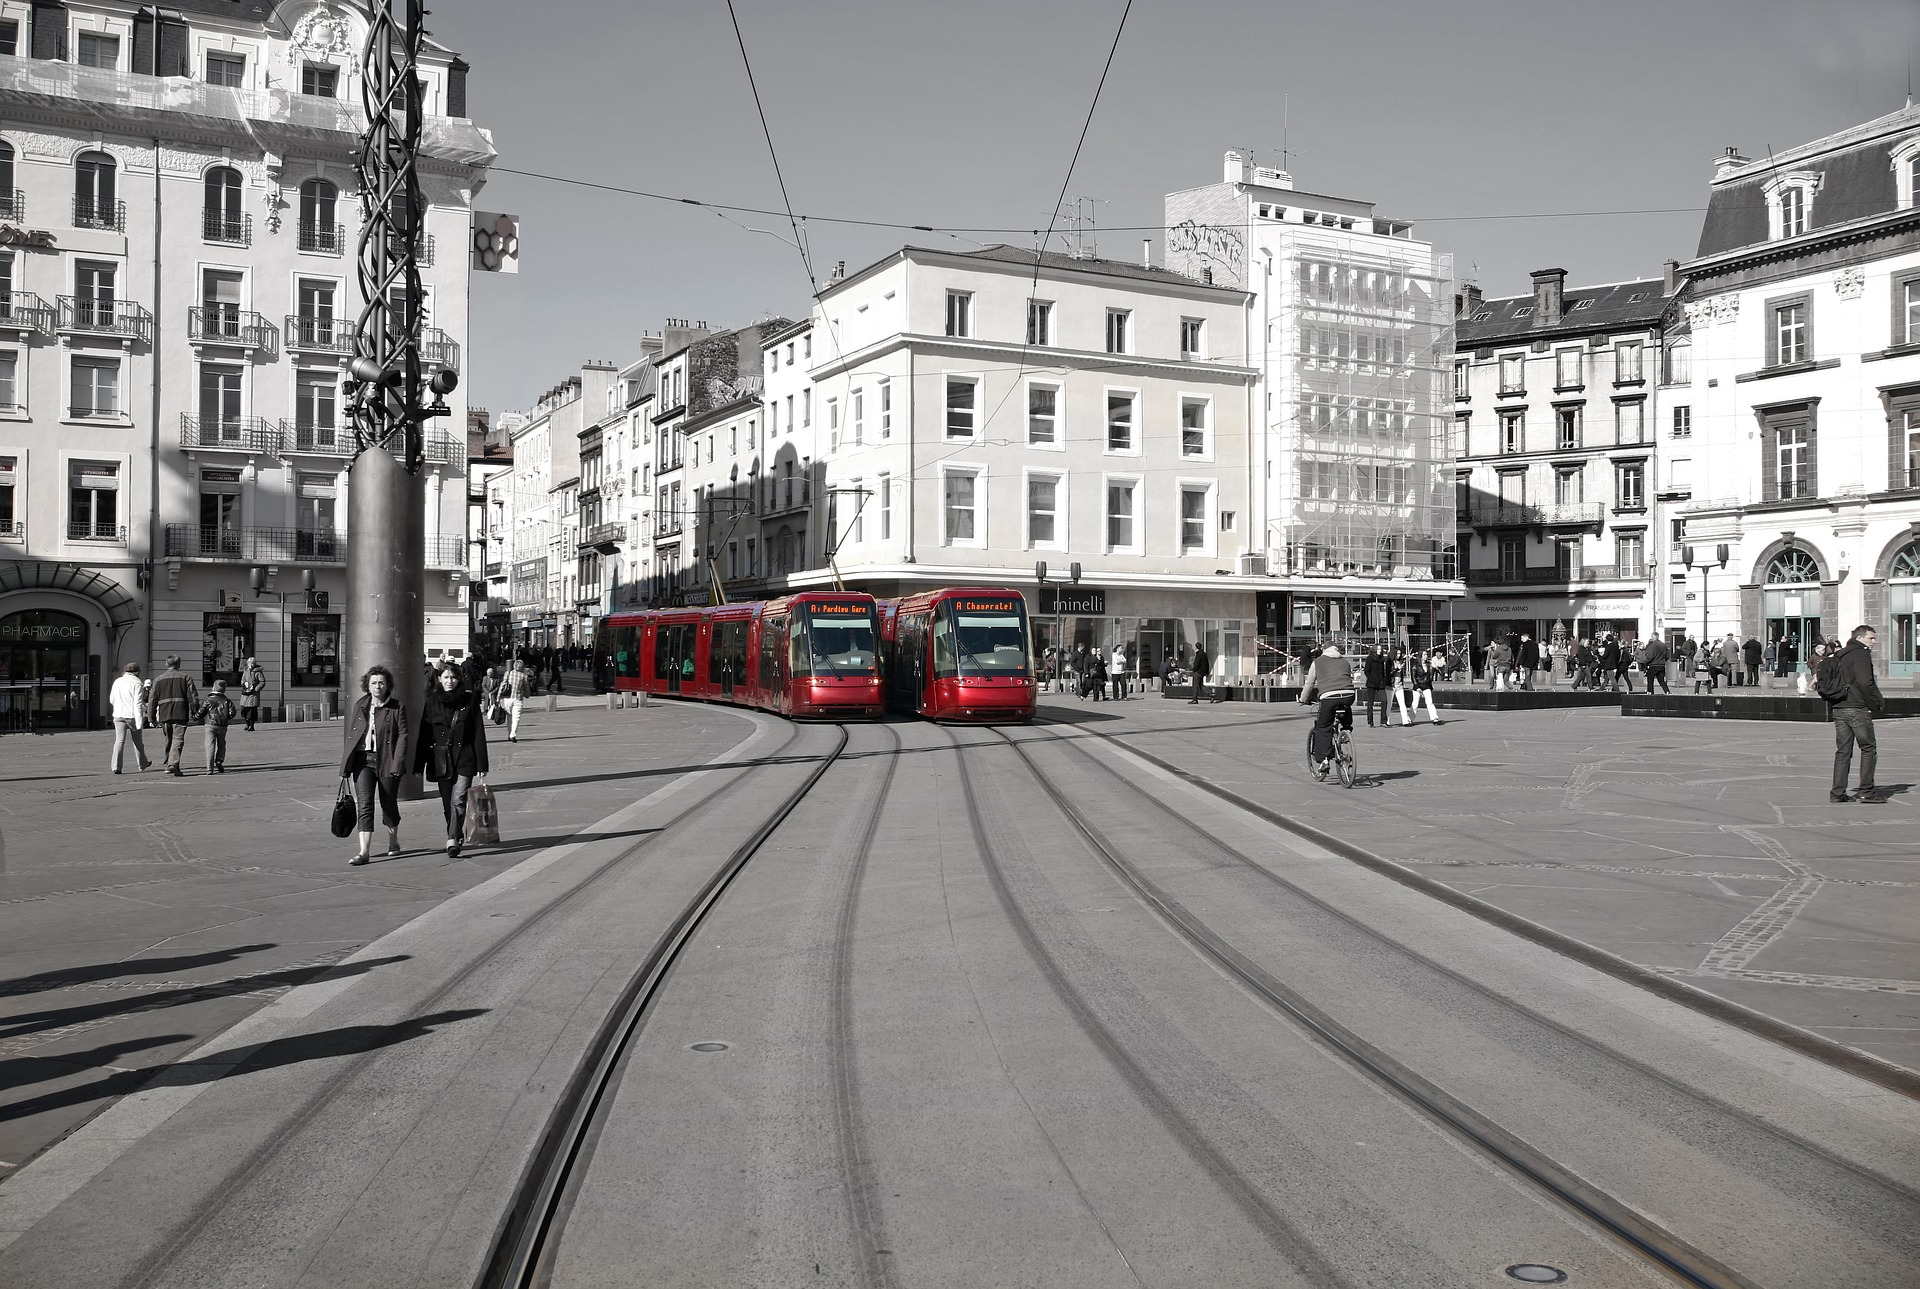 tram-2060768_1920